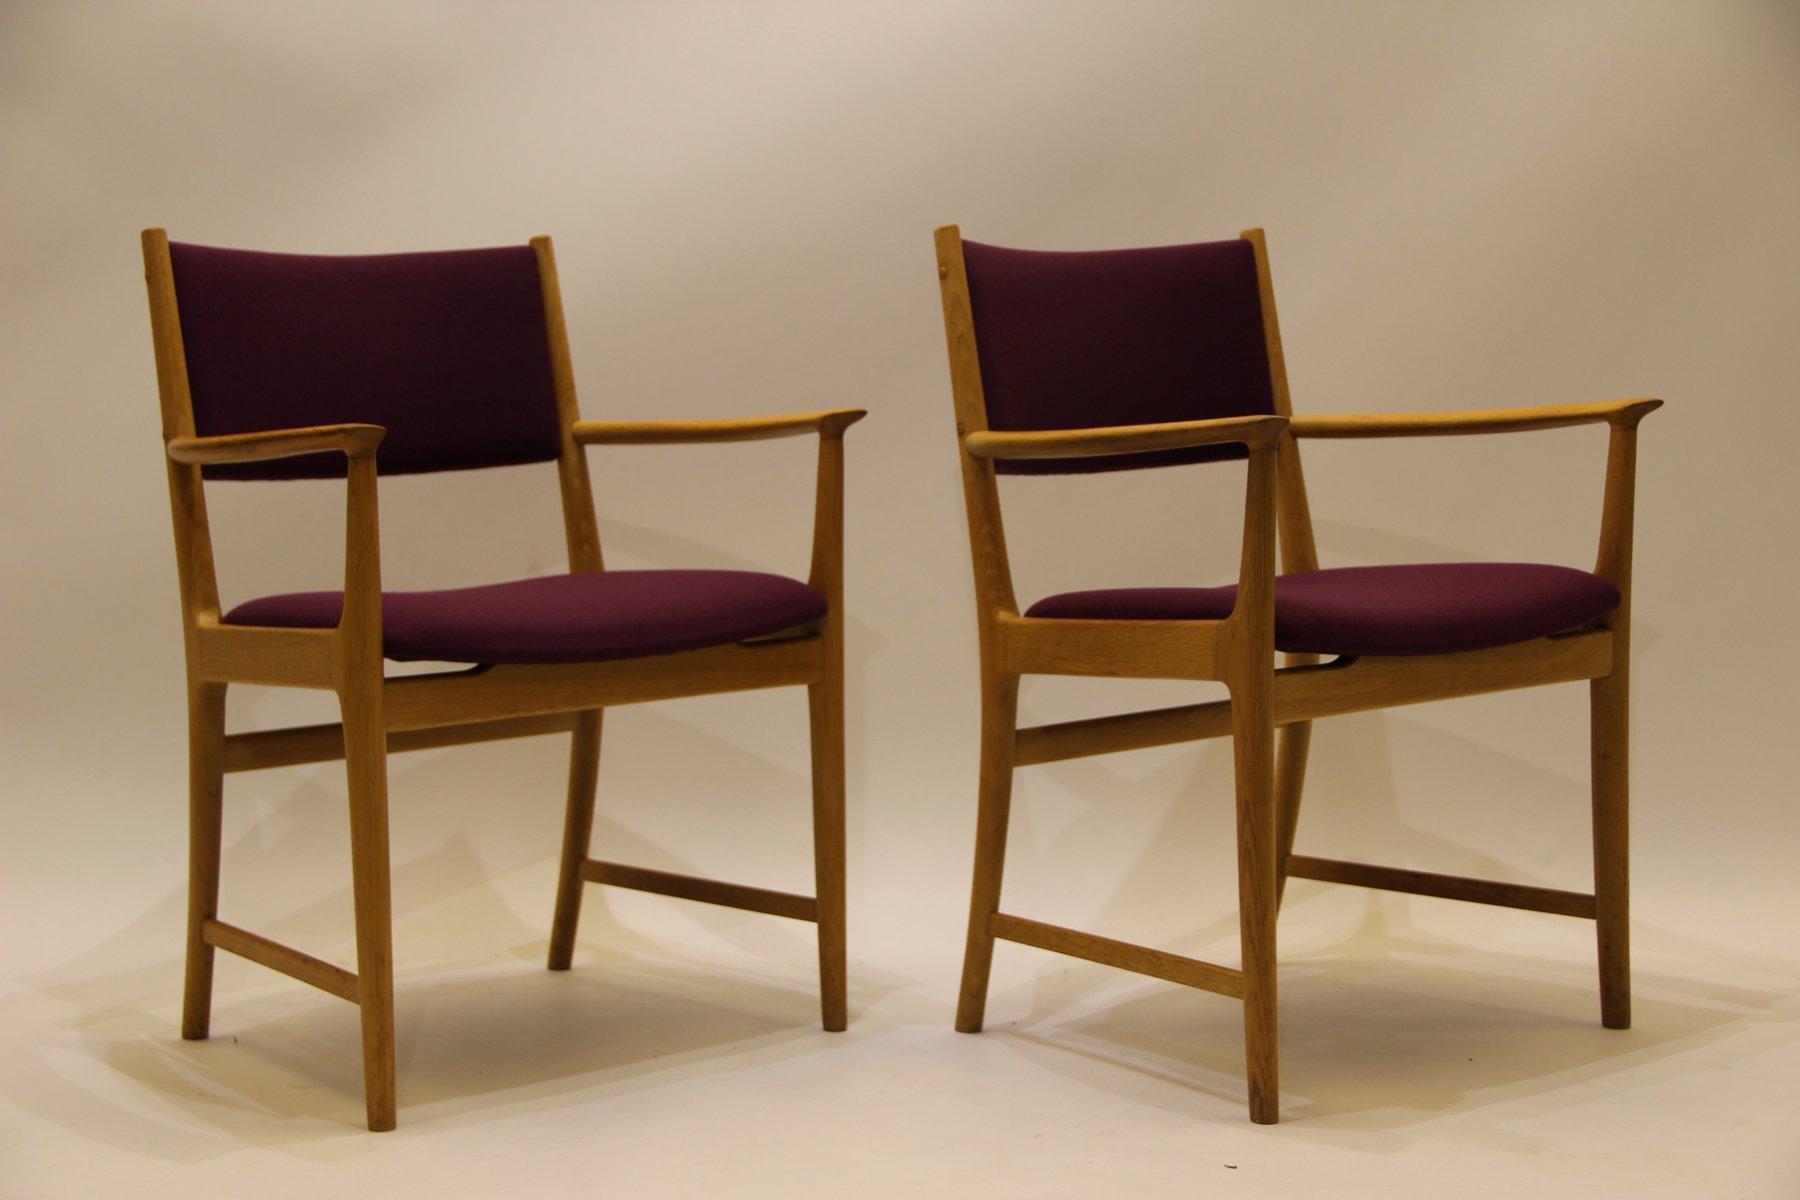 D nischer mid century stuhl aus eschenholz von kai lyngfeld larsen f r s ren wiladsen bei pamono - Mid century stuhl ...